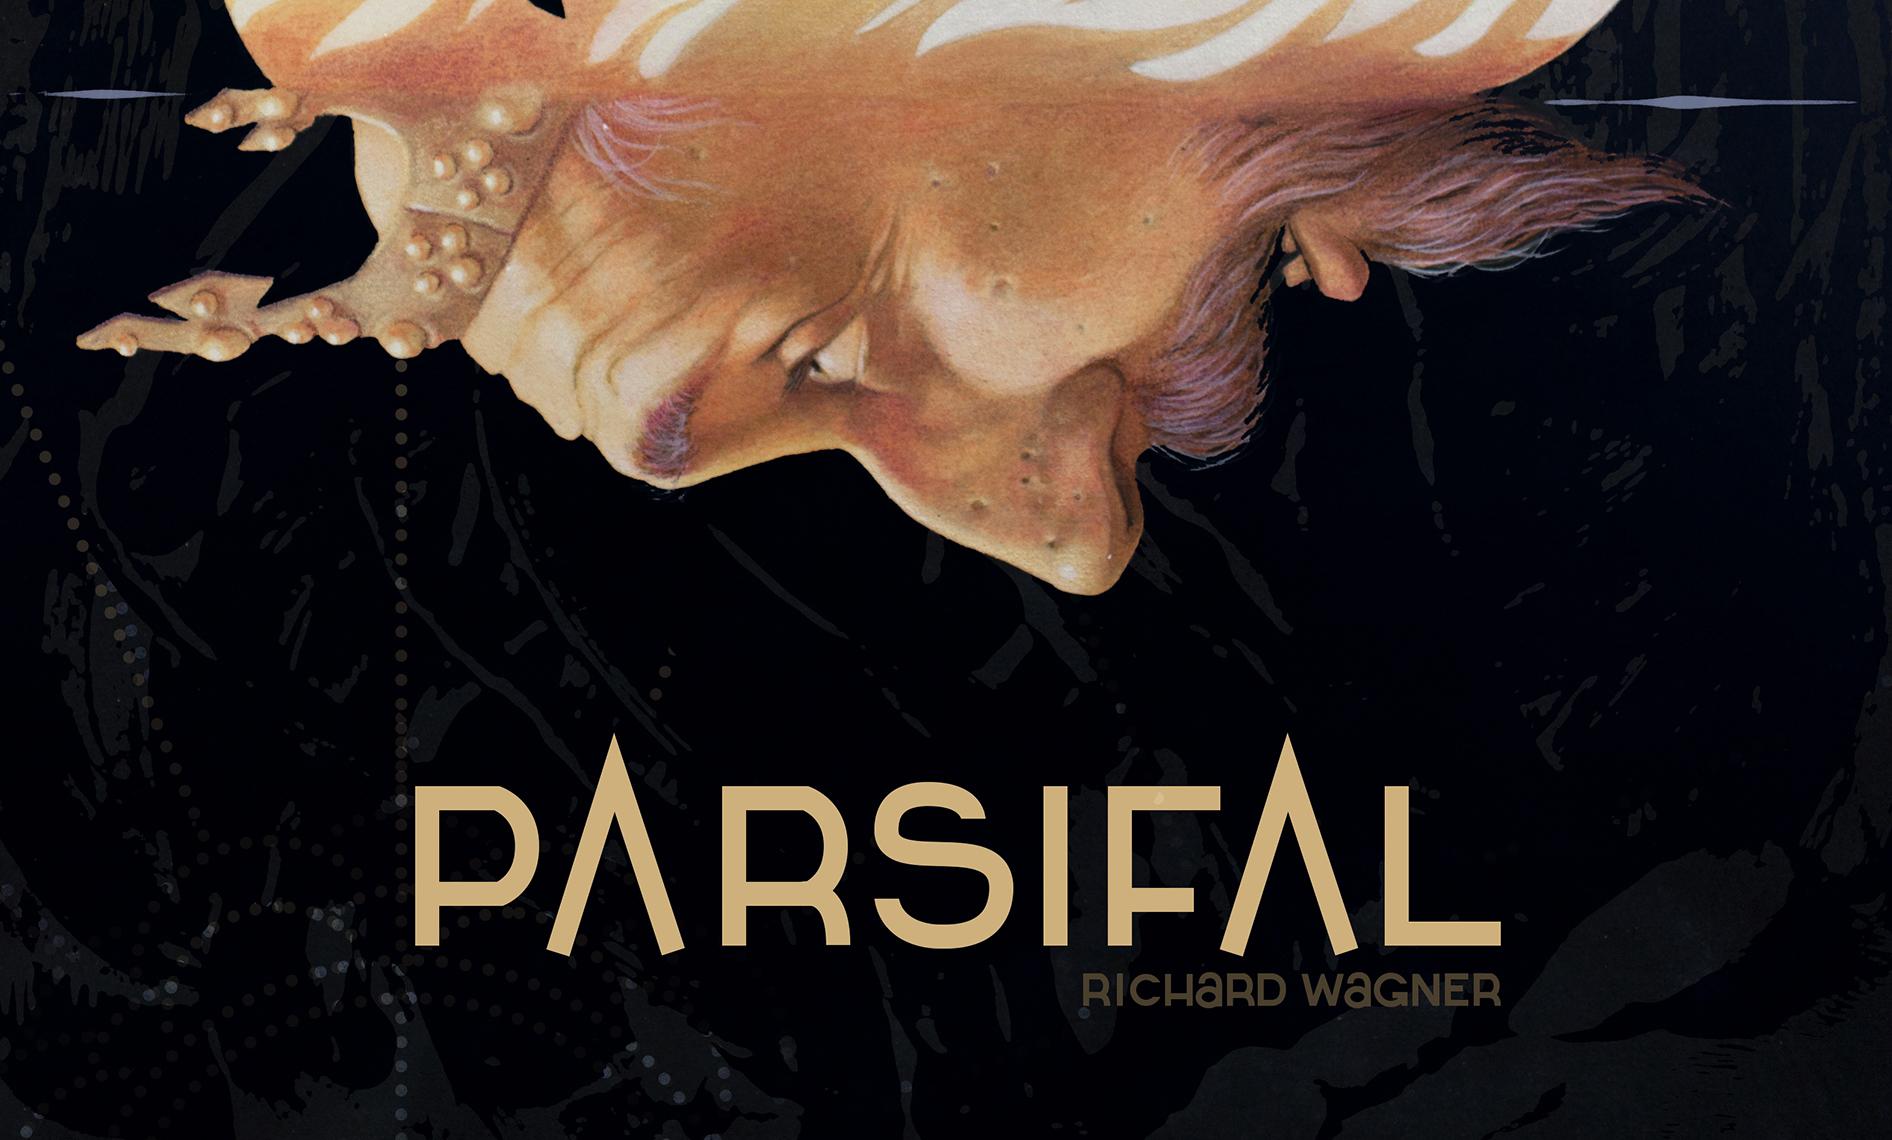 Parsifalsnippetbottom.jpg